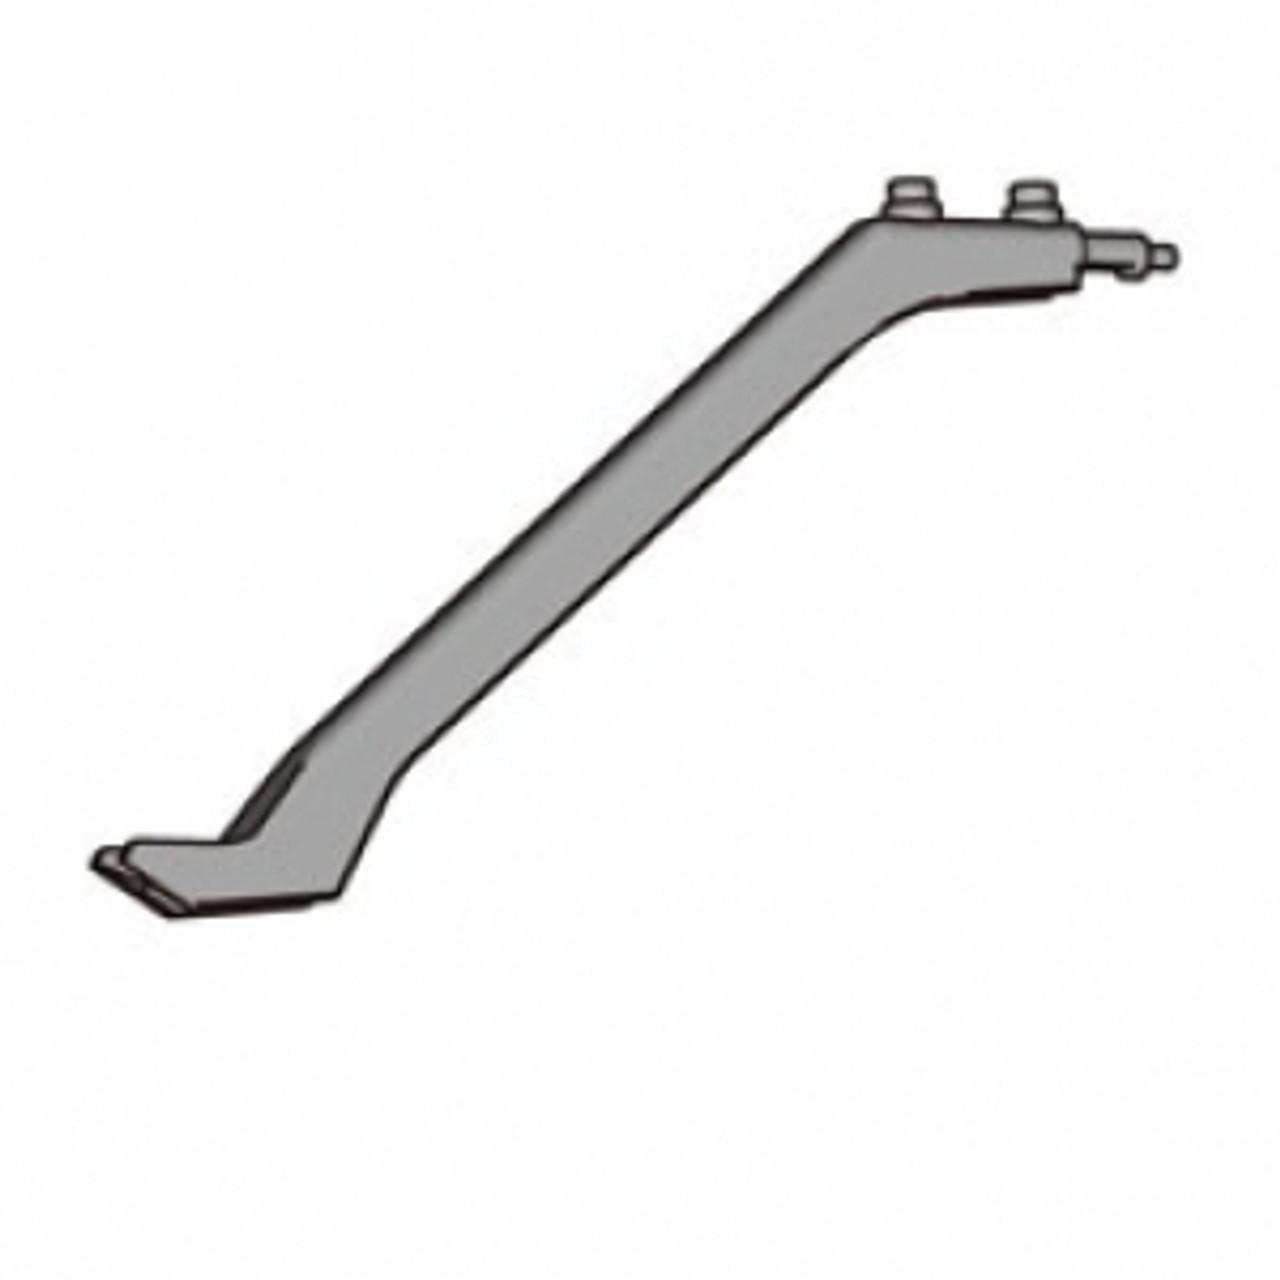 Tool (STL)